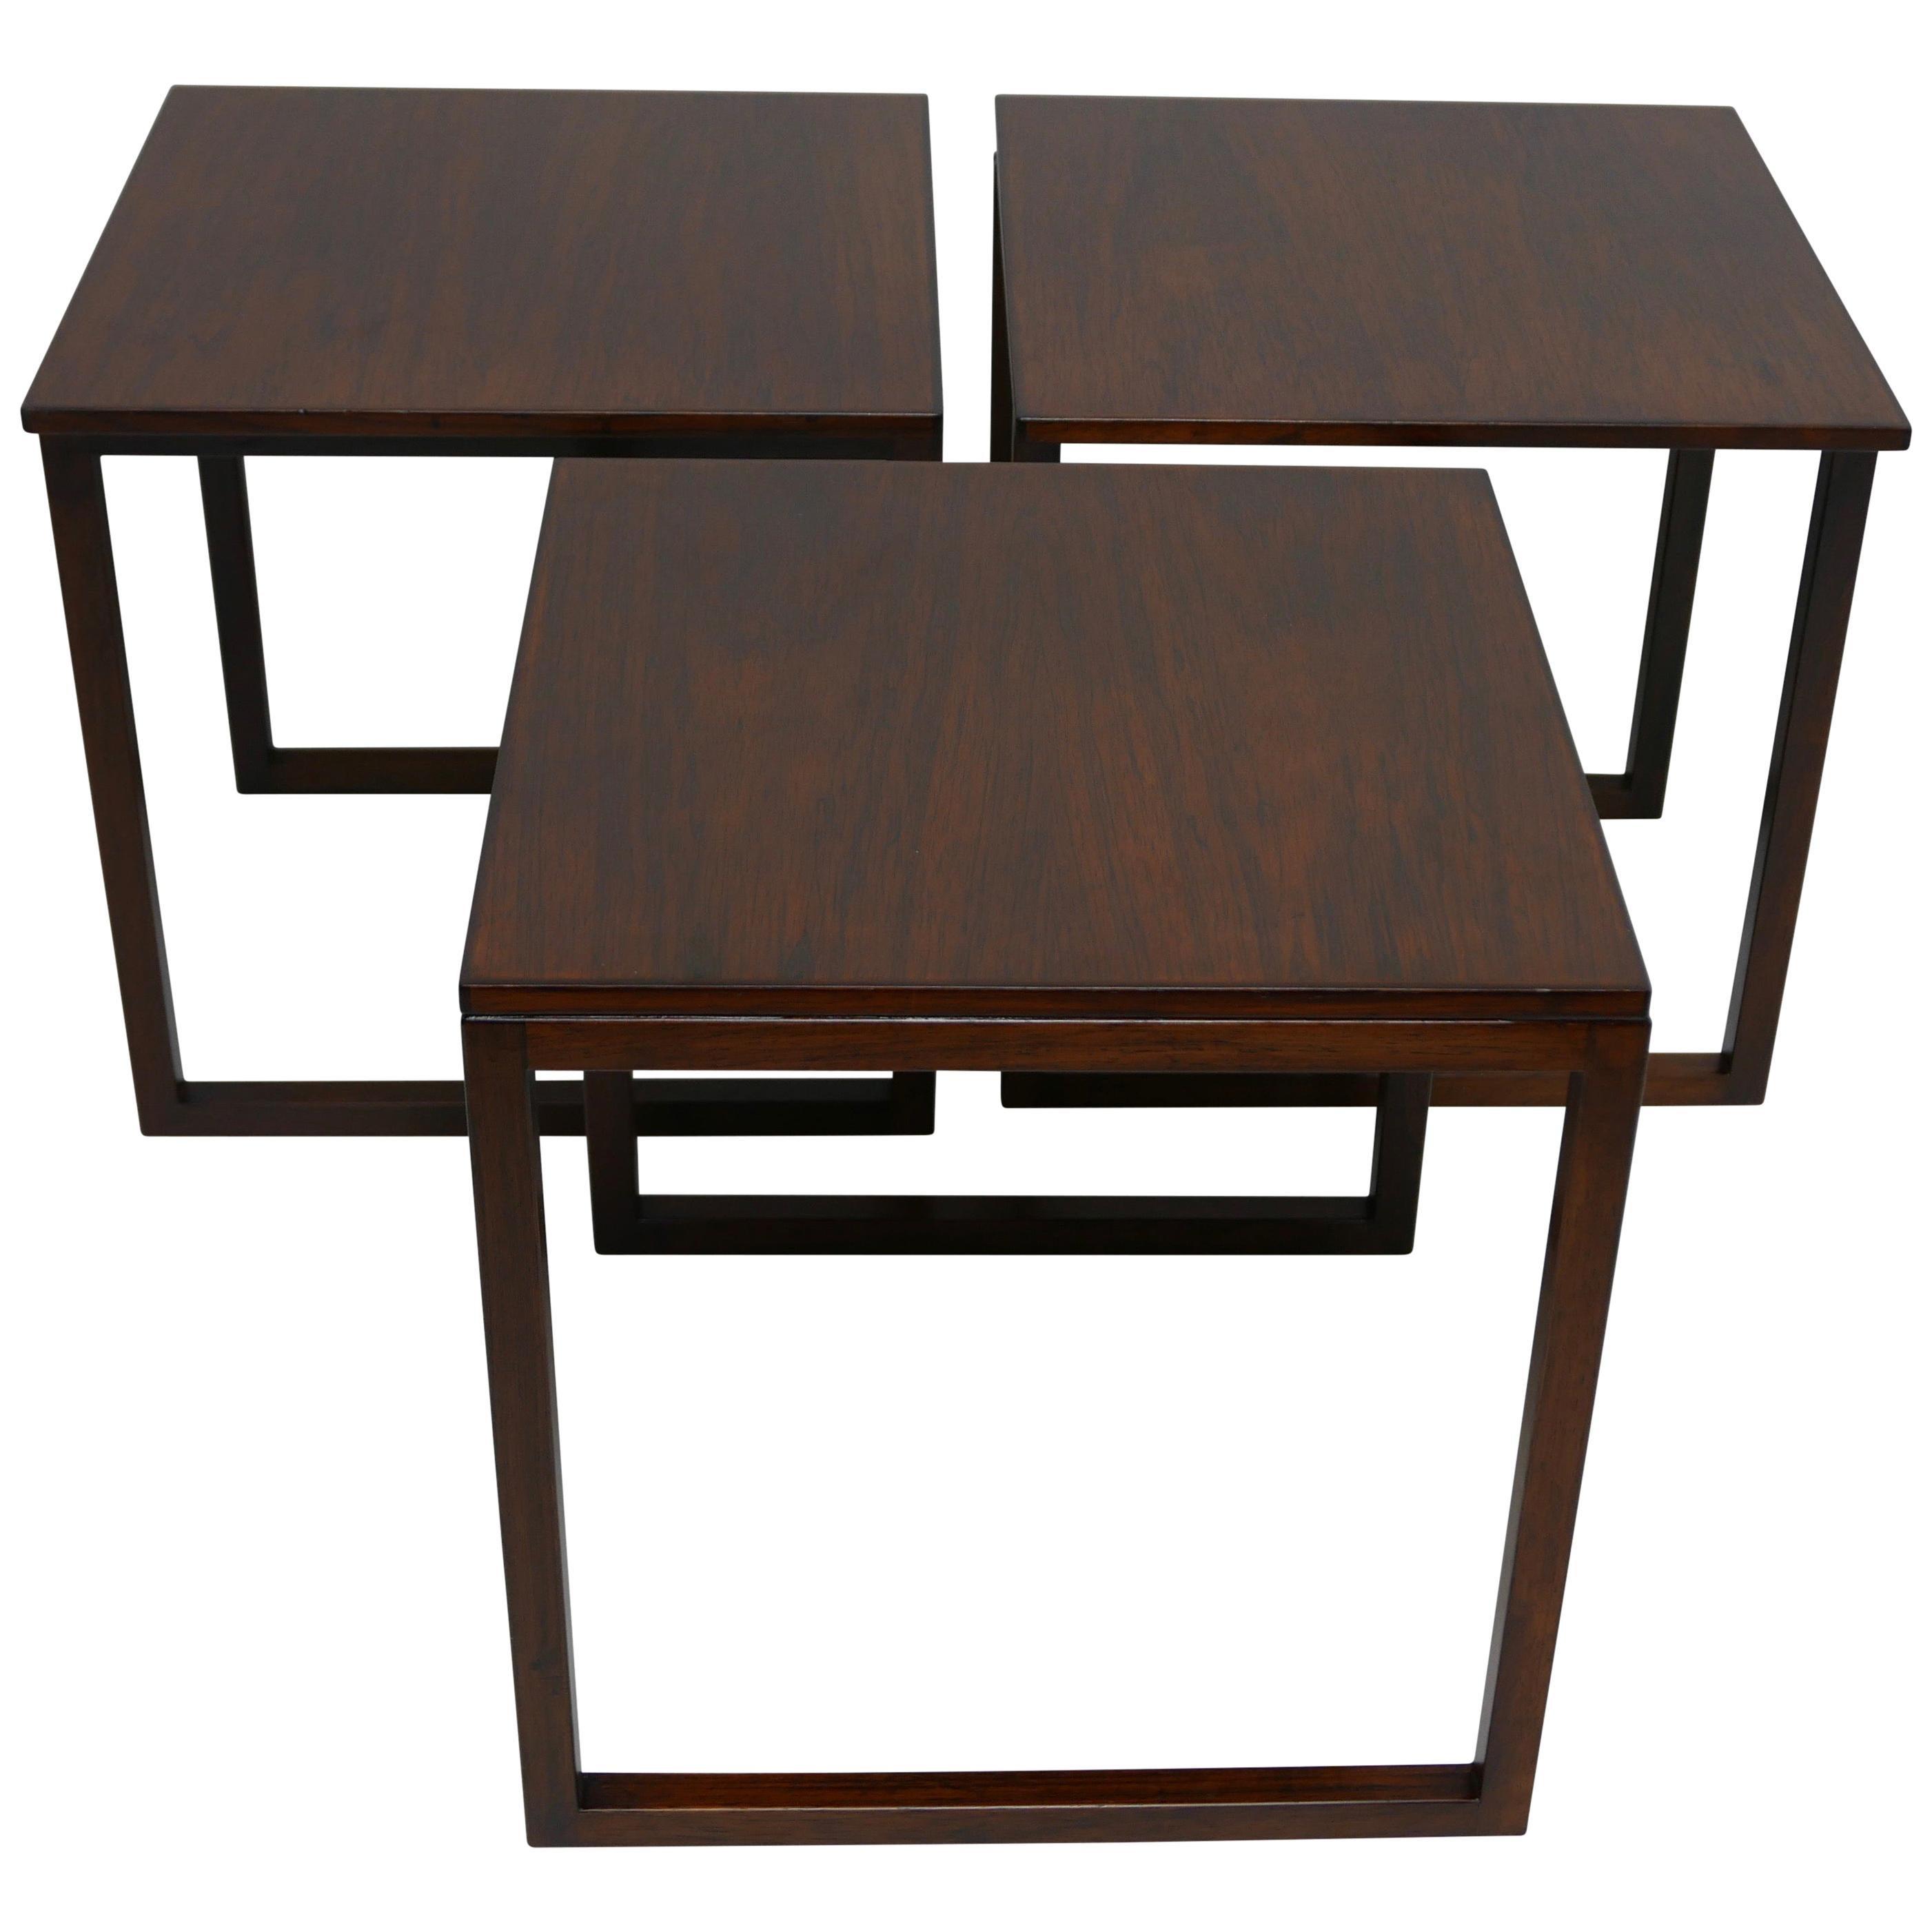 Midcentury Danish Modern Rosewood Nesting Tables, Set of Three